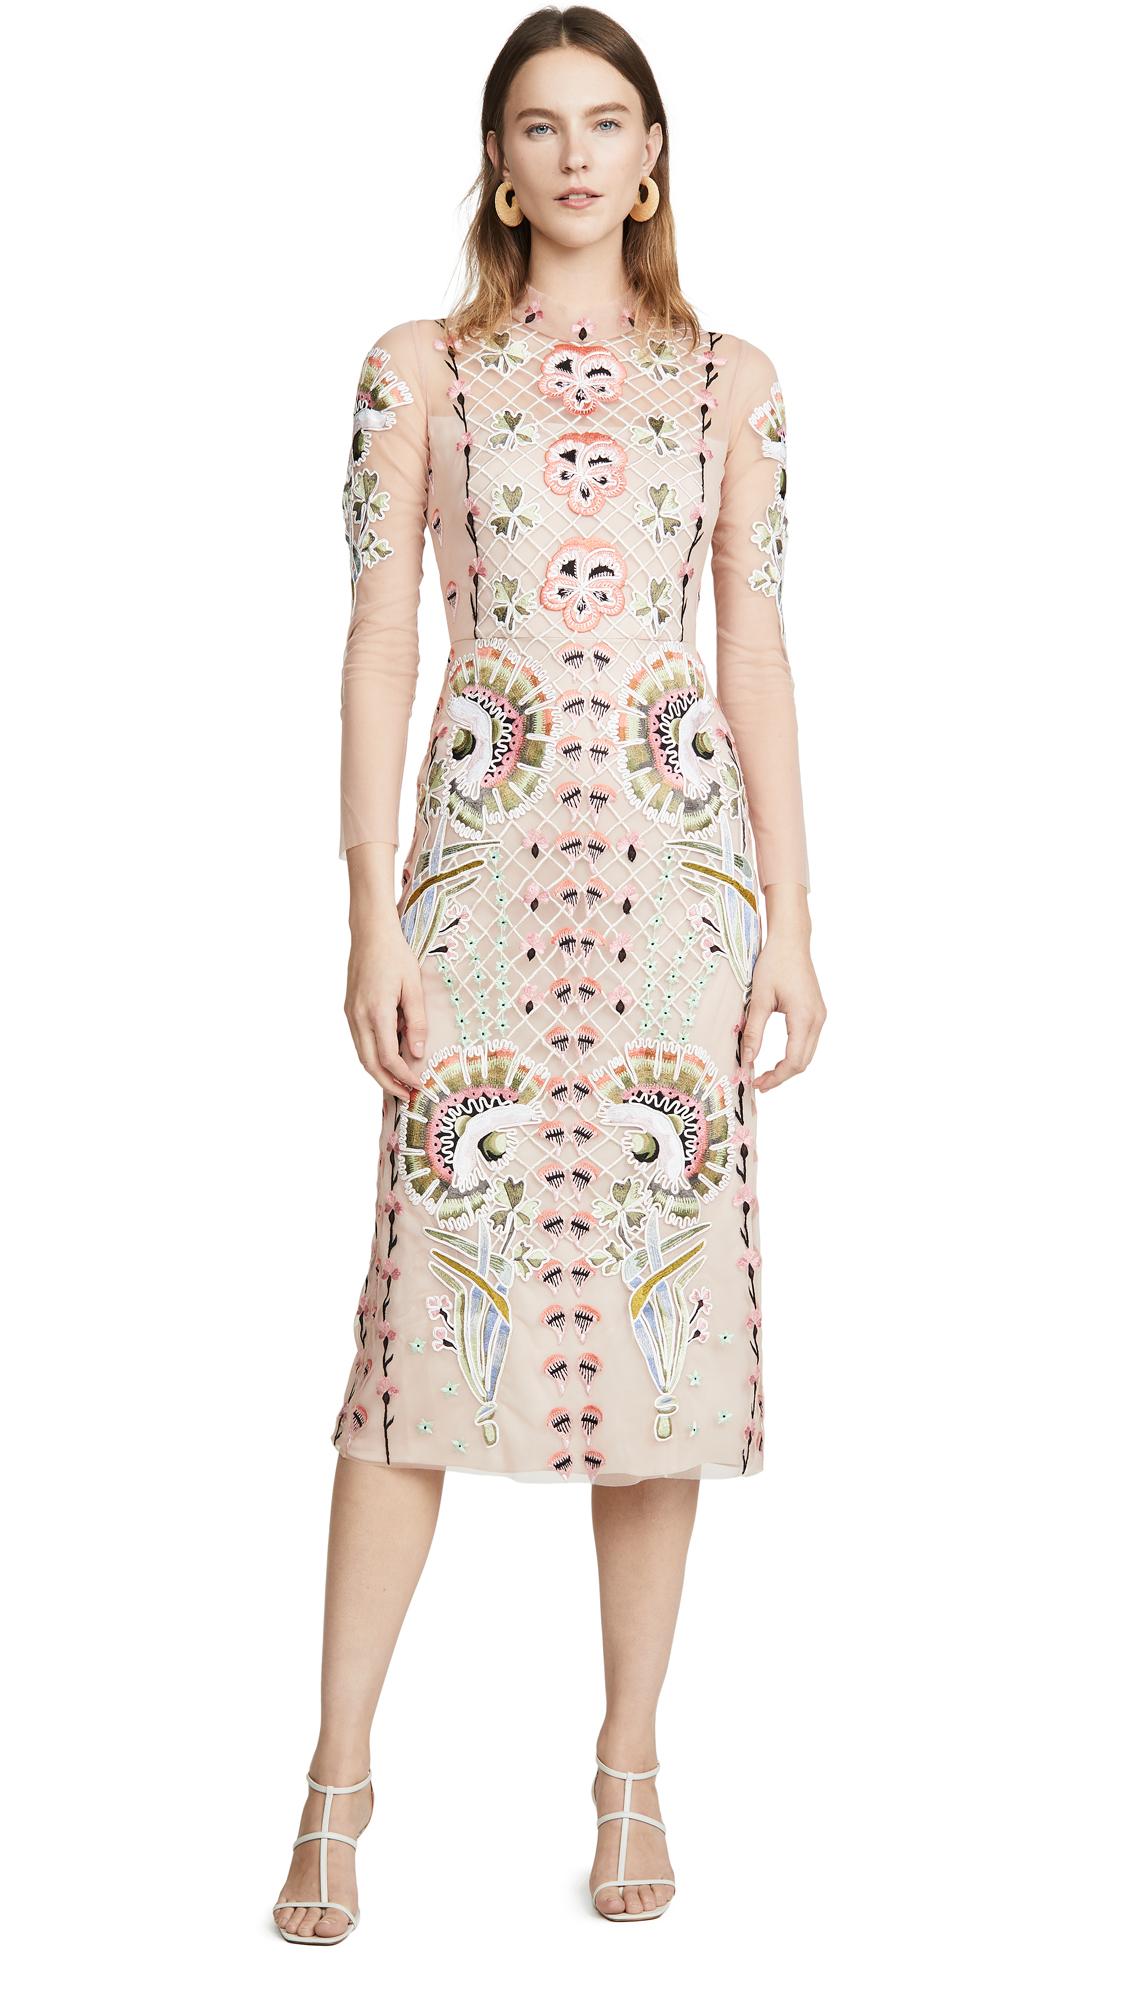 Temperley London Effie Cocktail Dress – 40% Off Sale